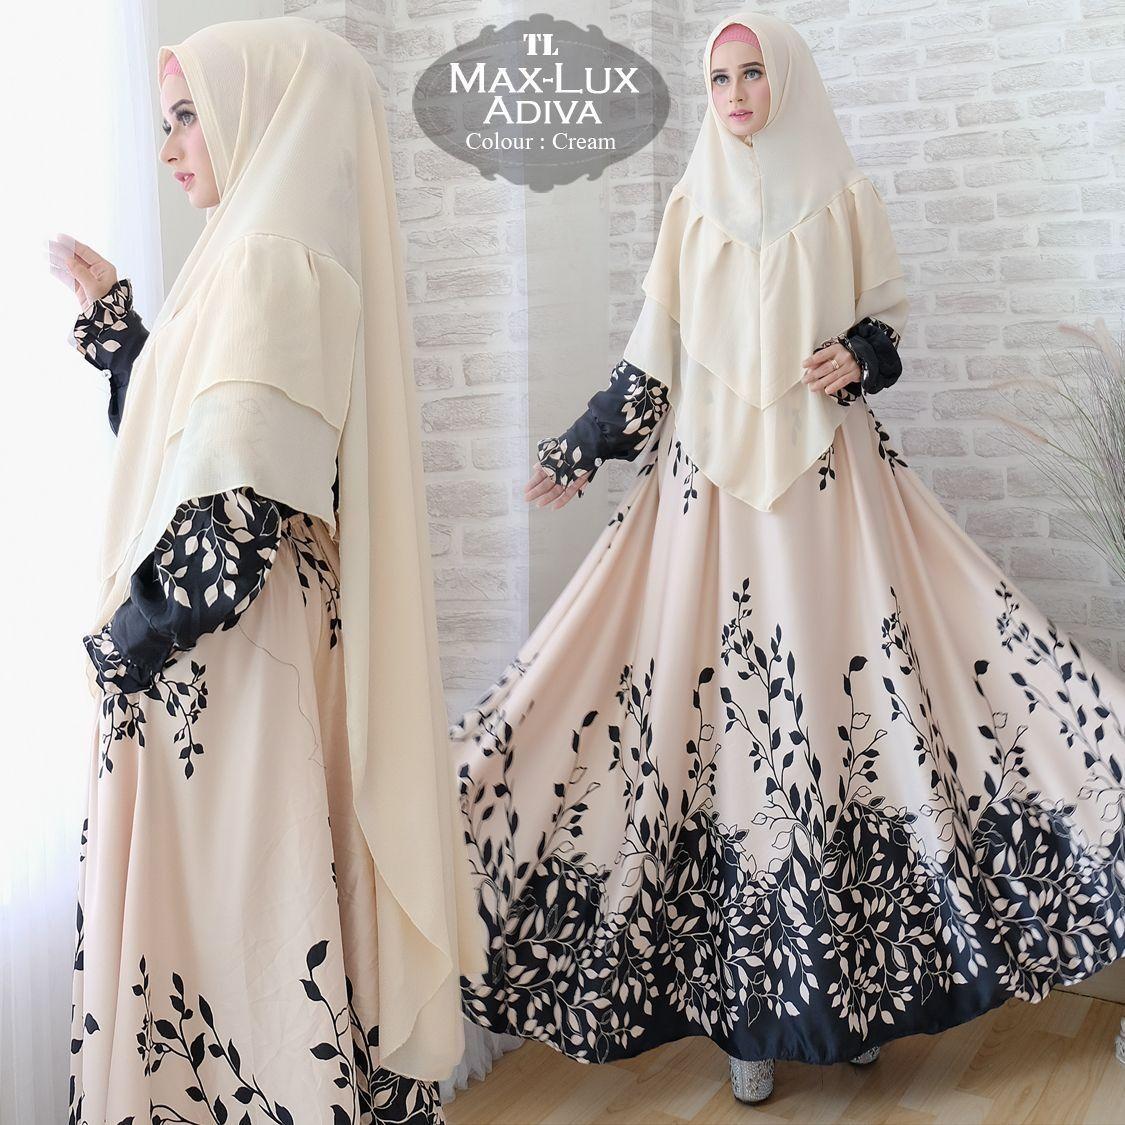 Kehebatan Baju Muslim Baju Jumsuit Baju Maxi Dress Gamis Remaja Masa